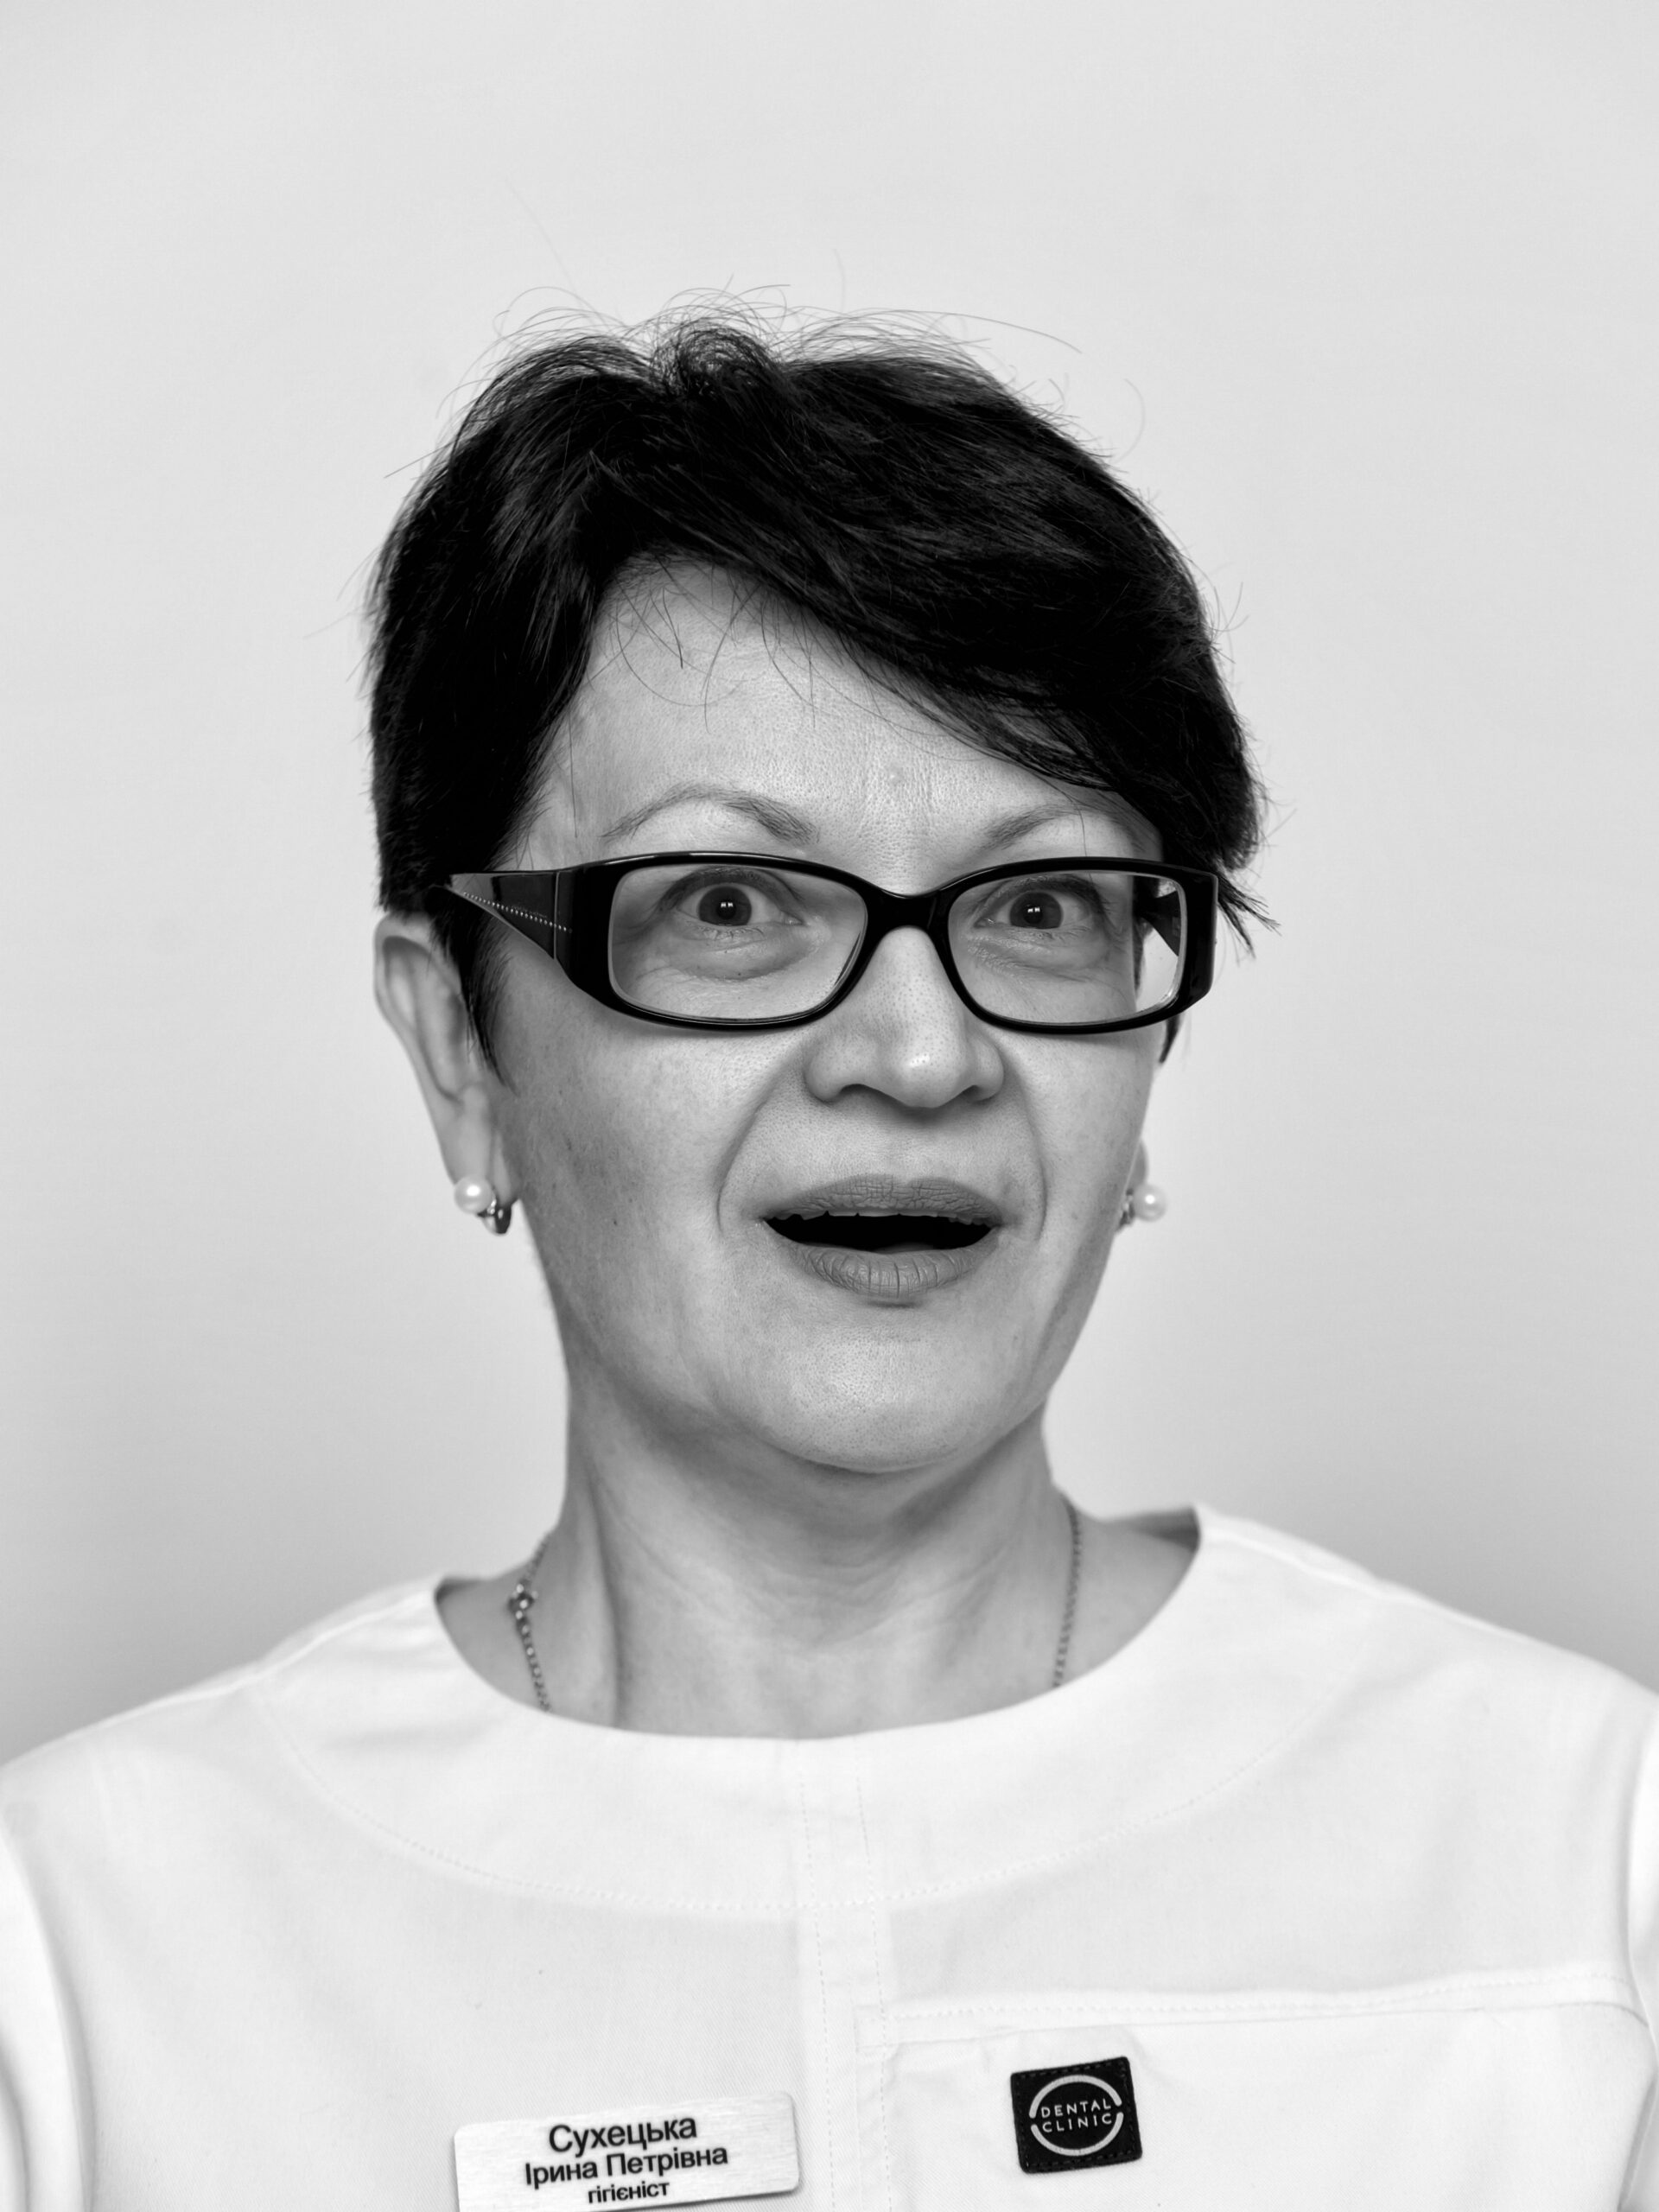 Сухецкая Ирина